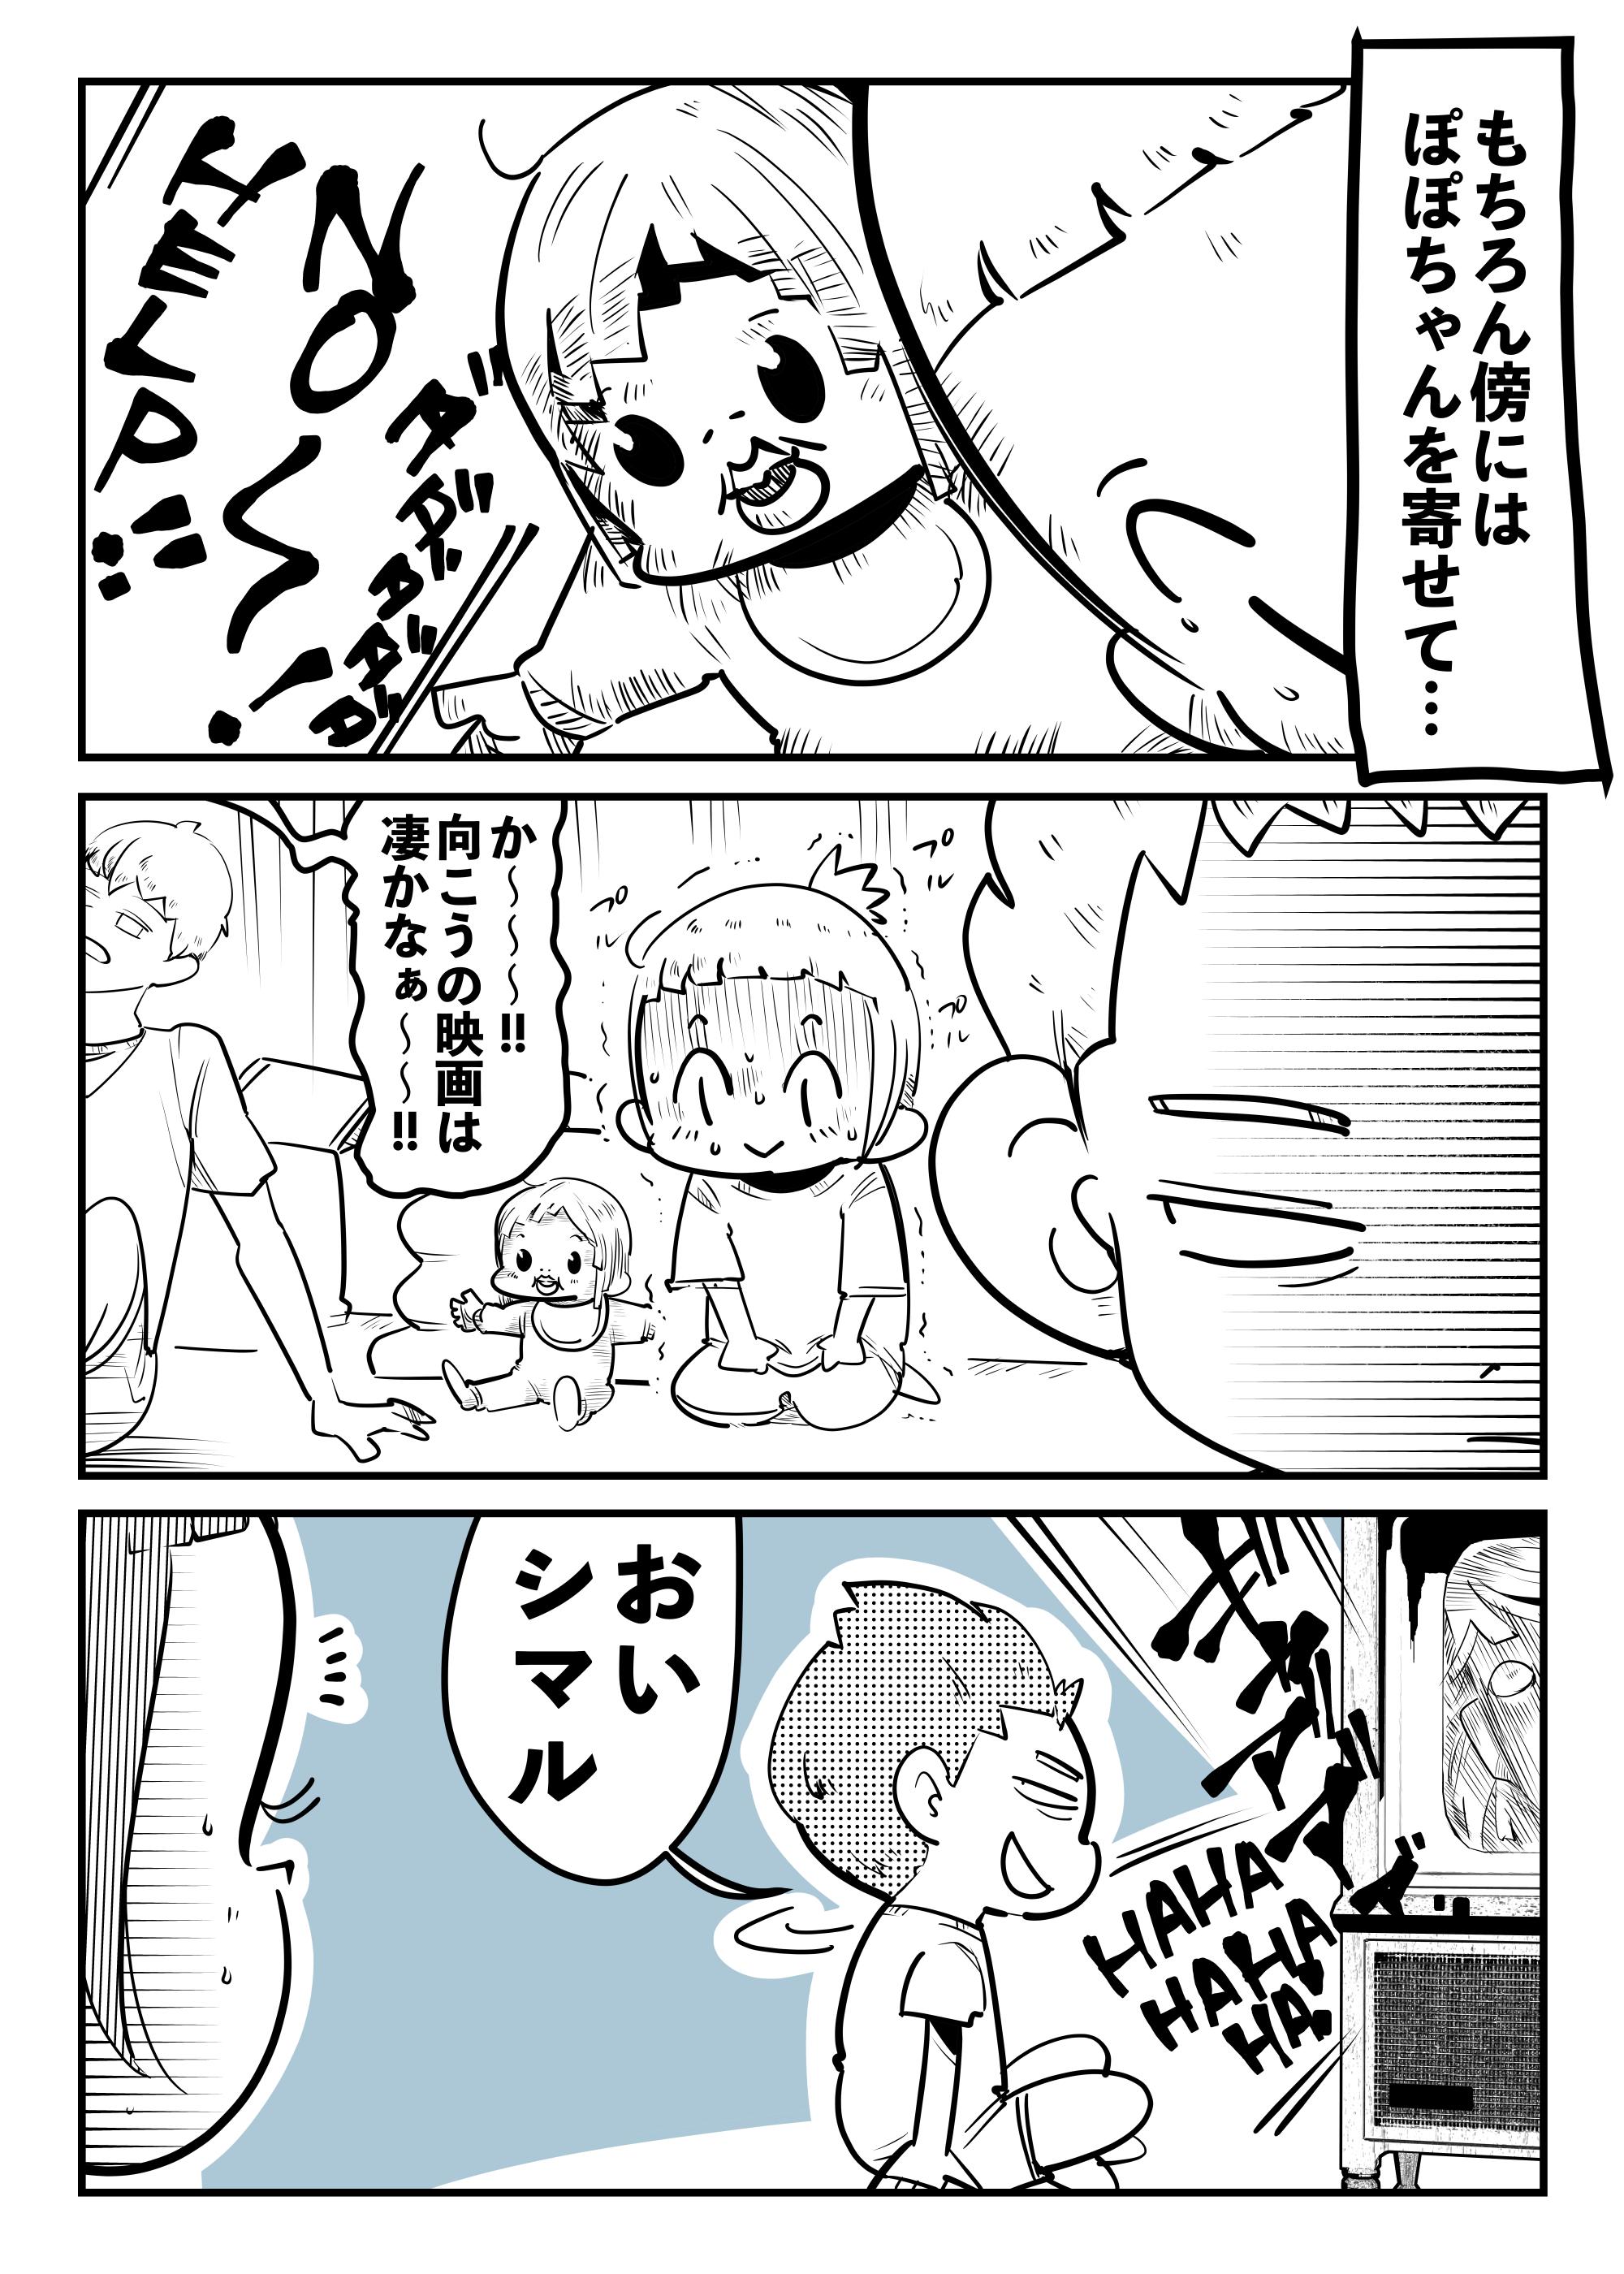 f:id:terashimaru117:20210917155613p:plain